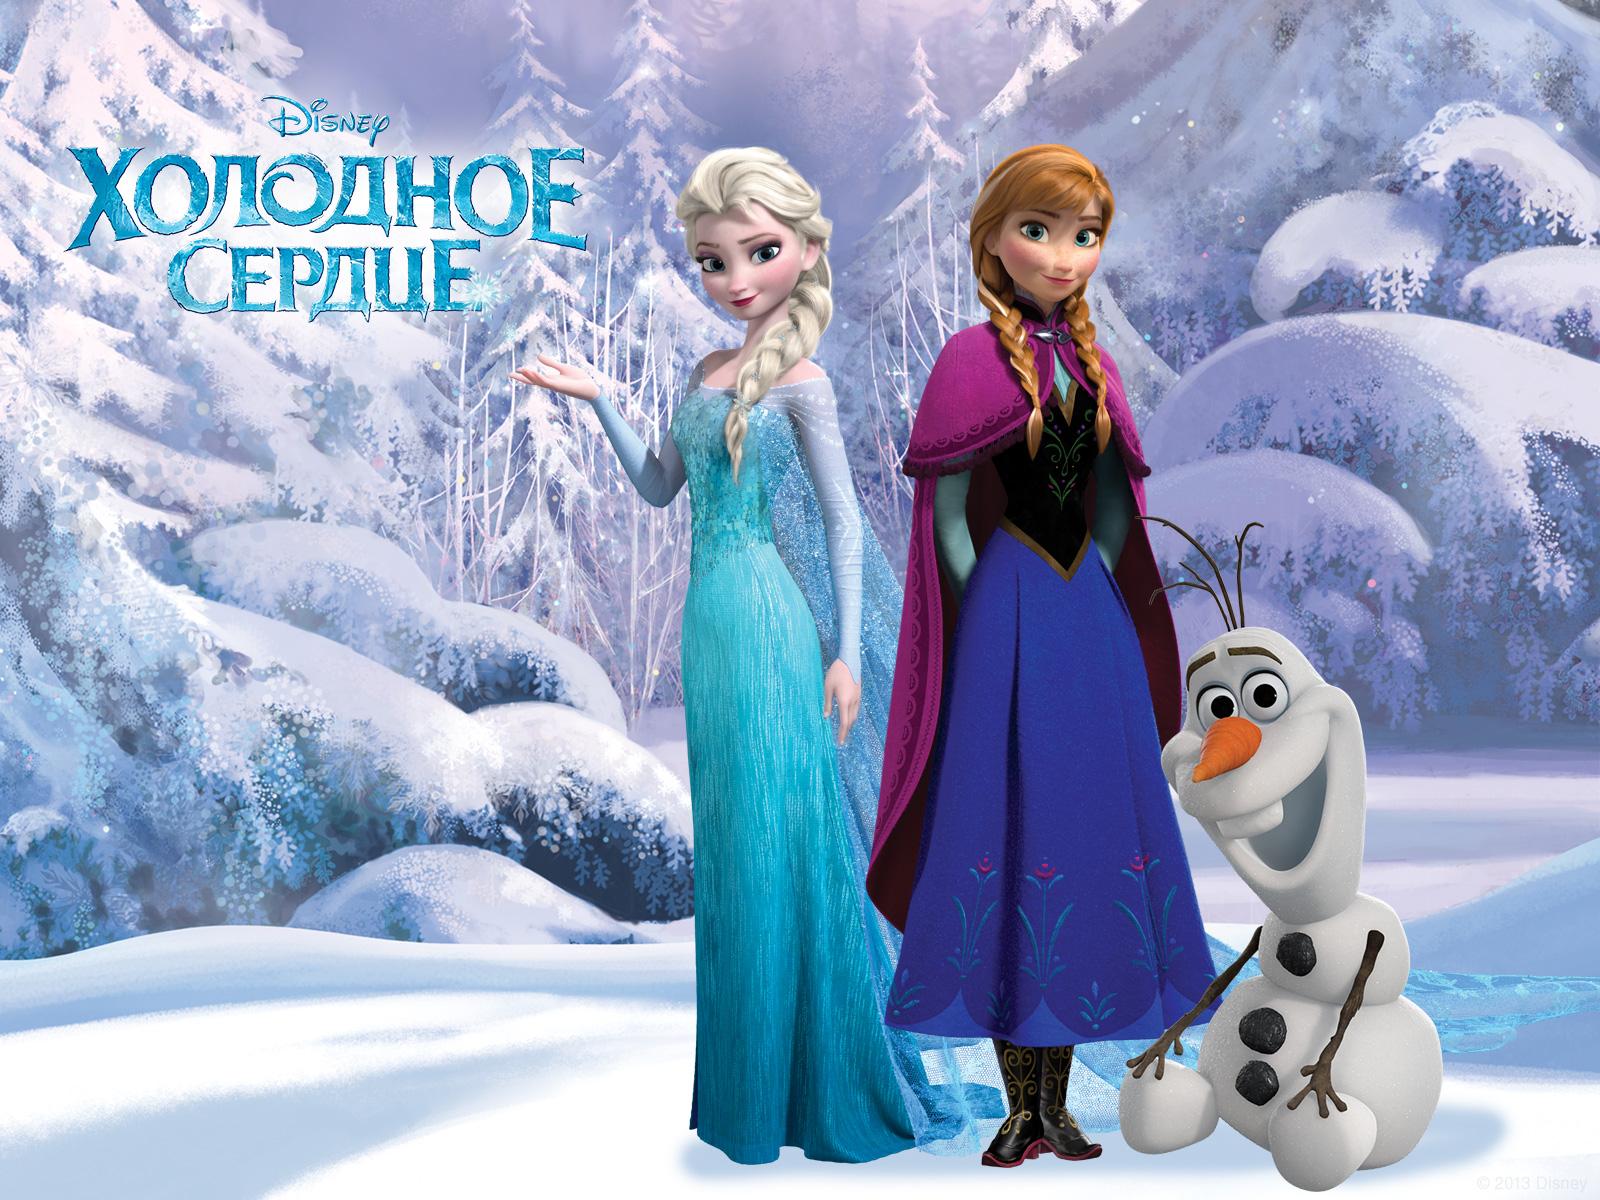 elsa and anna wallpapers,snow,cartoon,animated cartoon,winter,doll